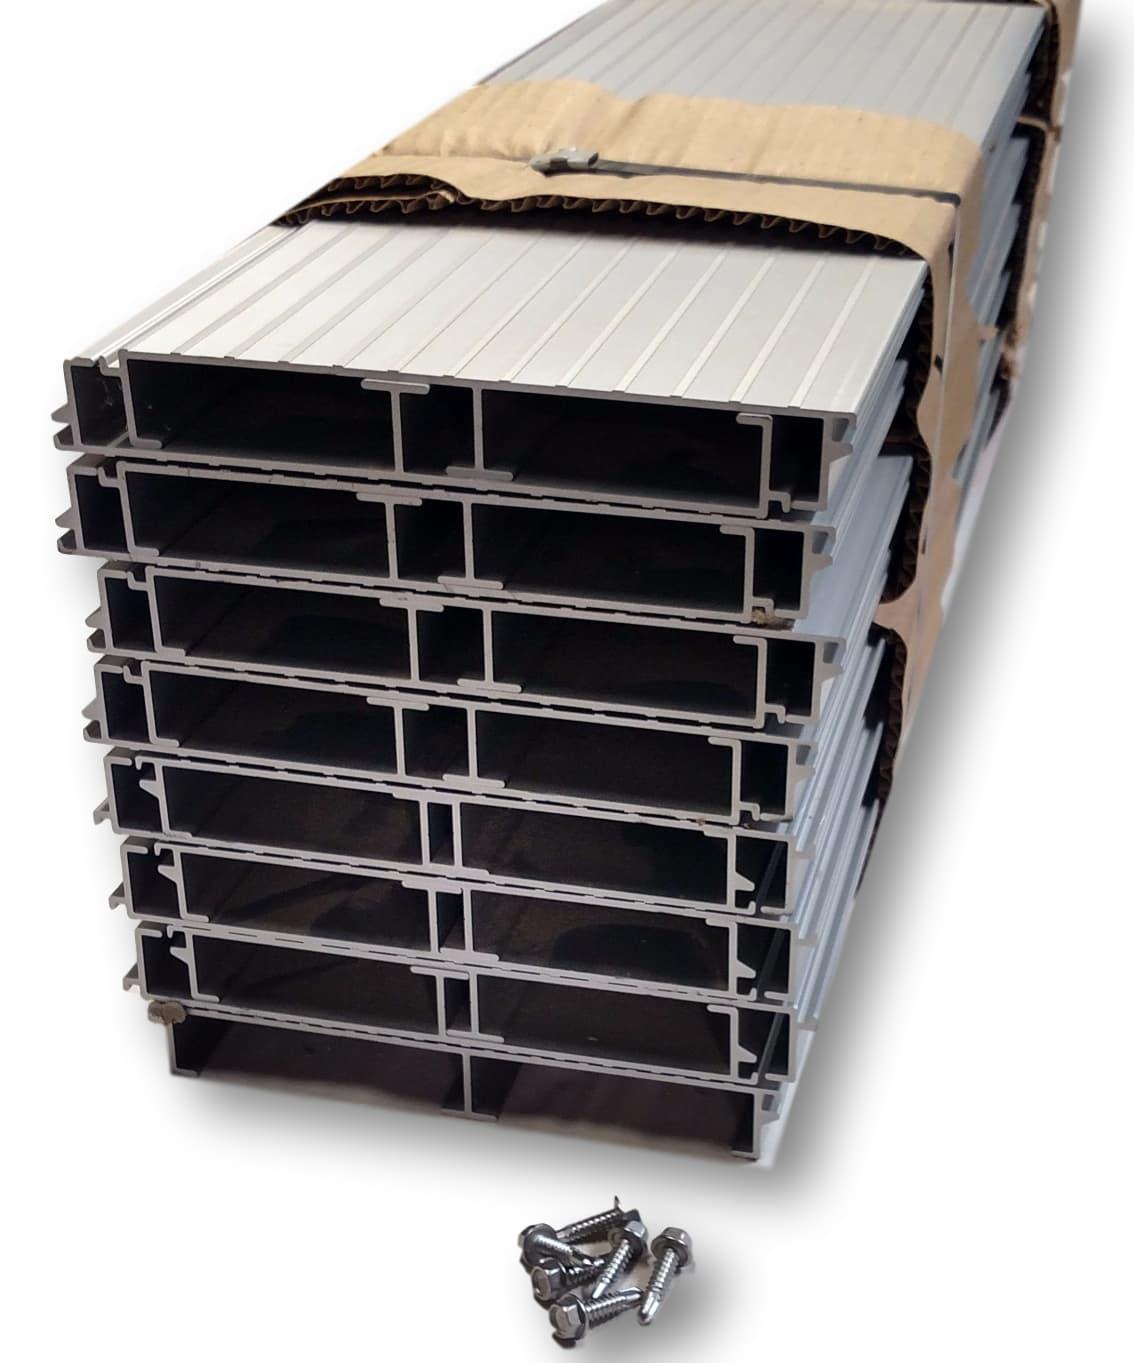 Anodized Aluminum Dock Rebuild Kit